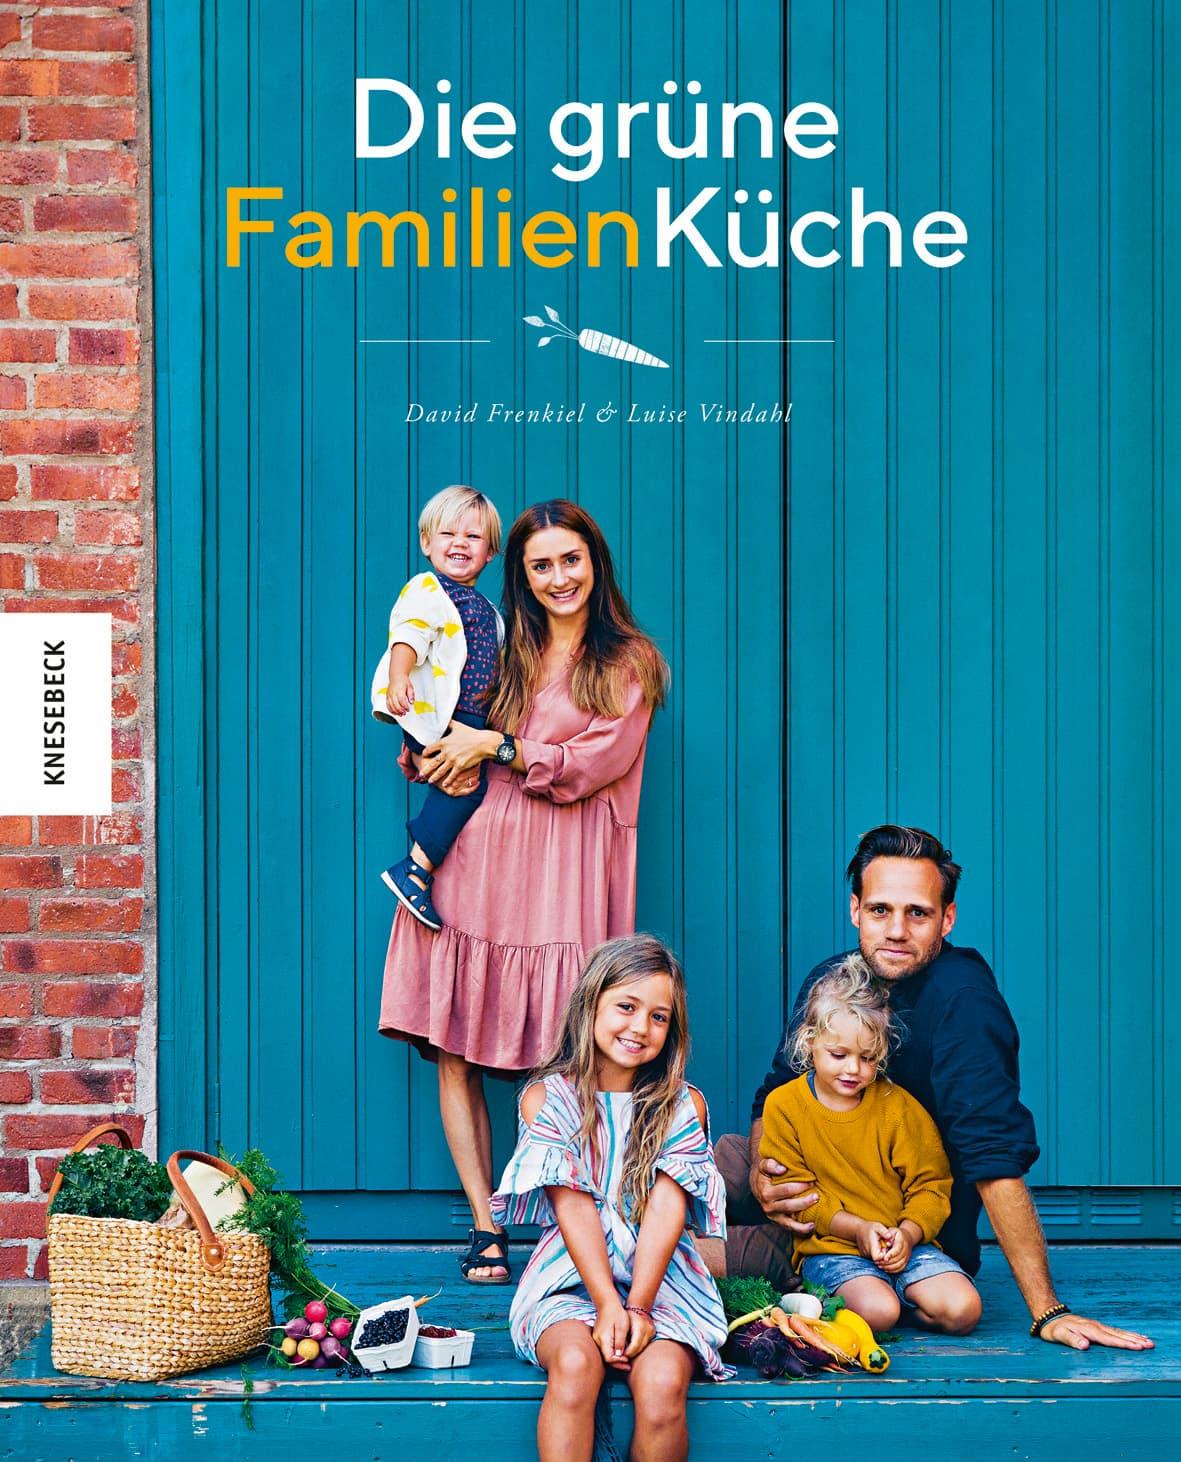 Die grüne Familienküche // HIMBEER